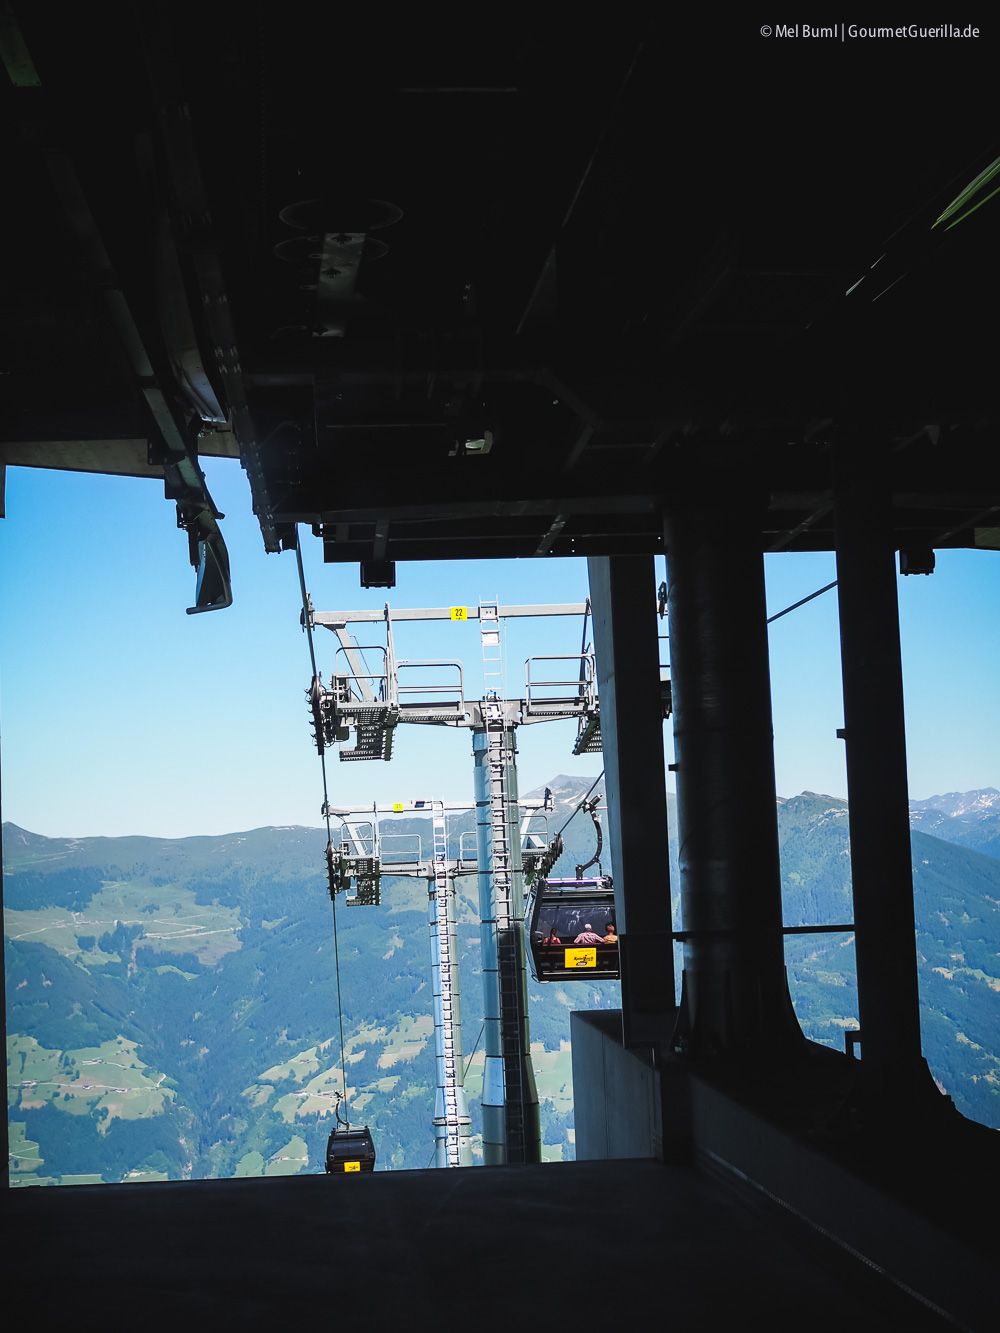 Spieljochbahn Fügen Best of Zillertal |GourmetGuerilla.de